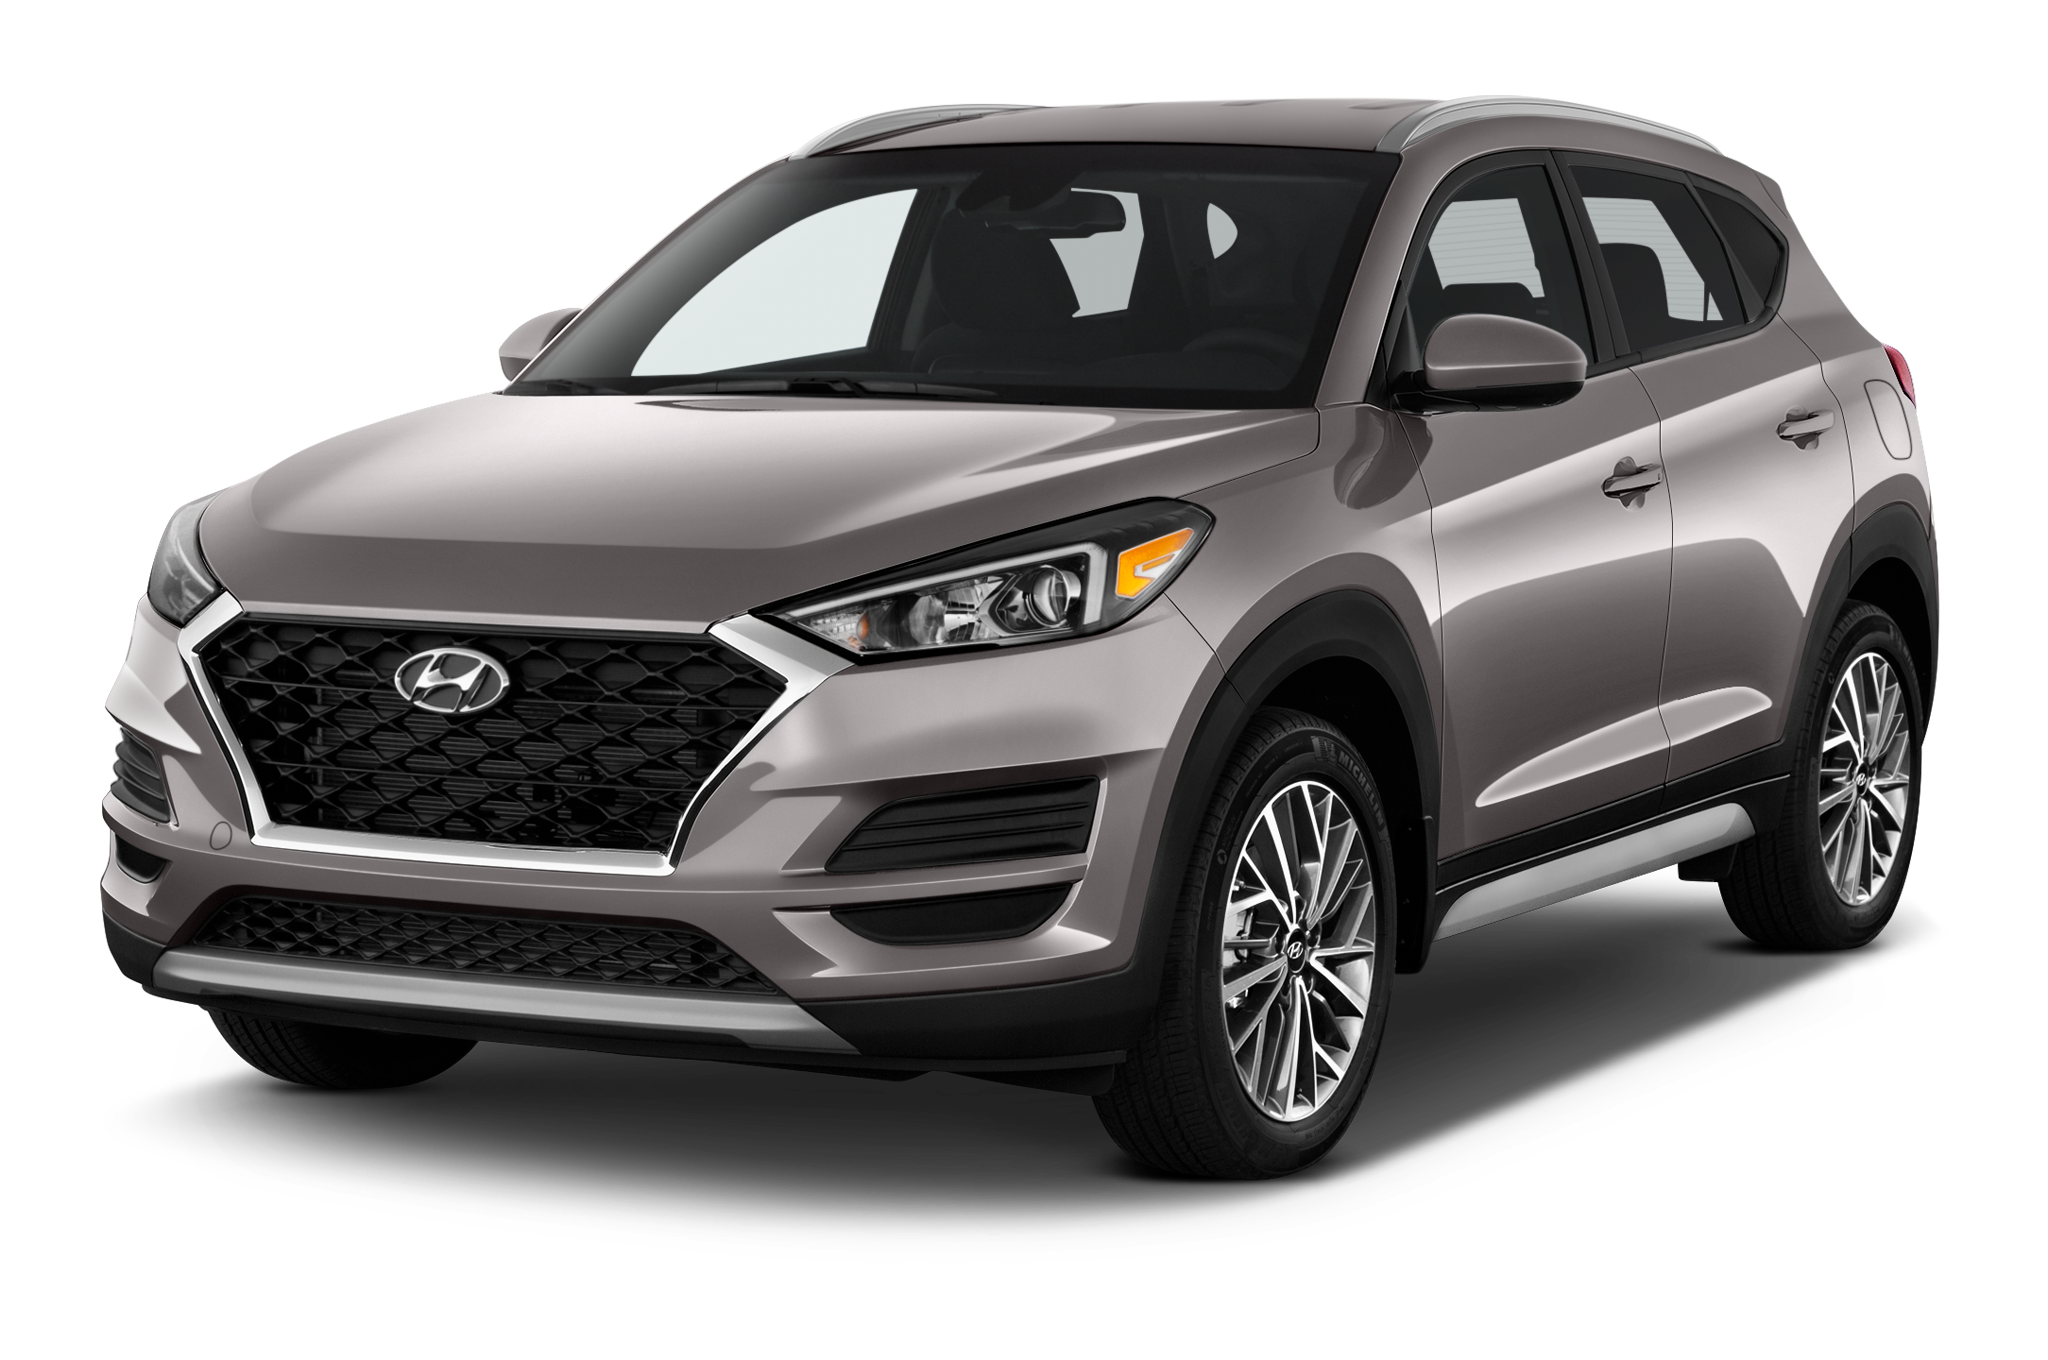 2019 Hyundai Tucson Overview